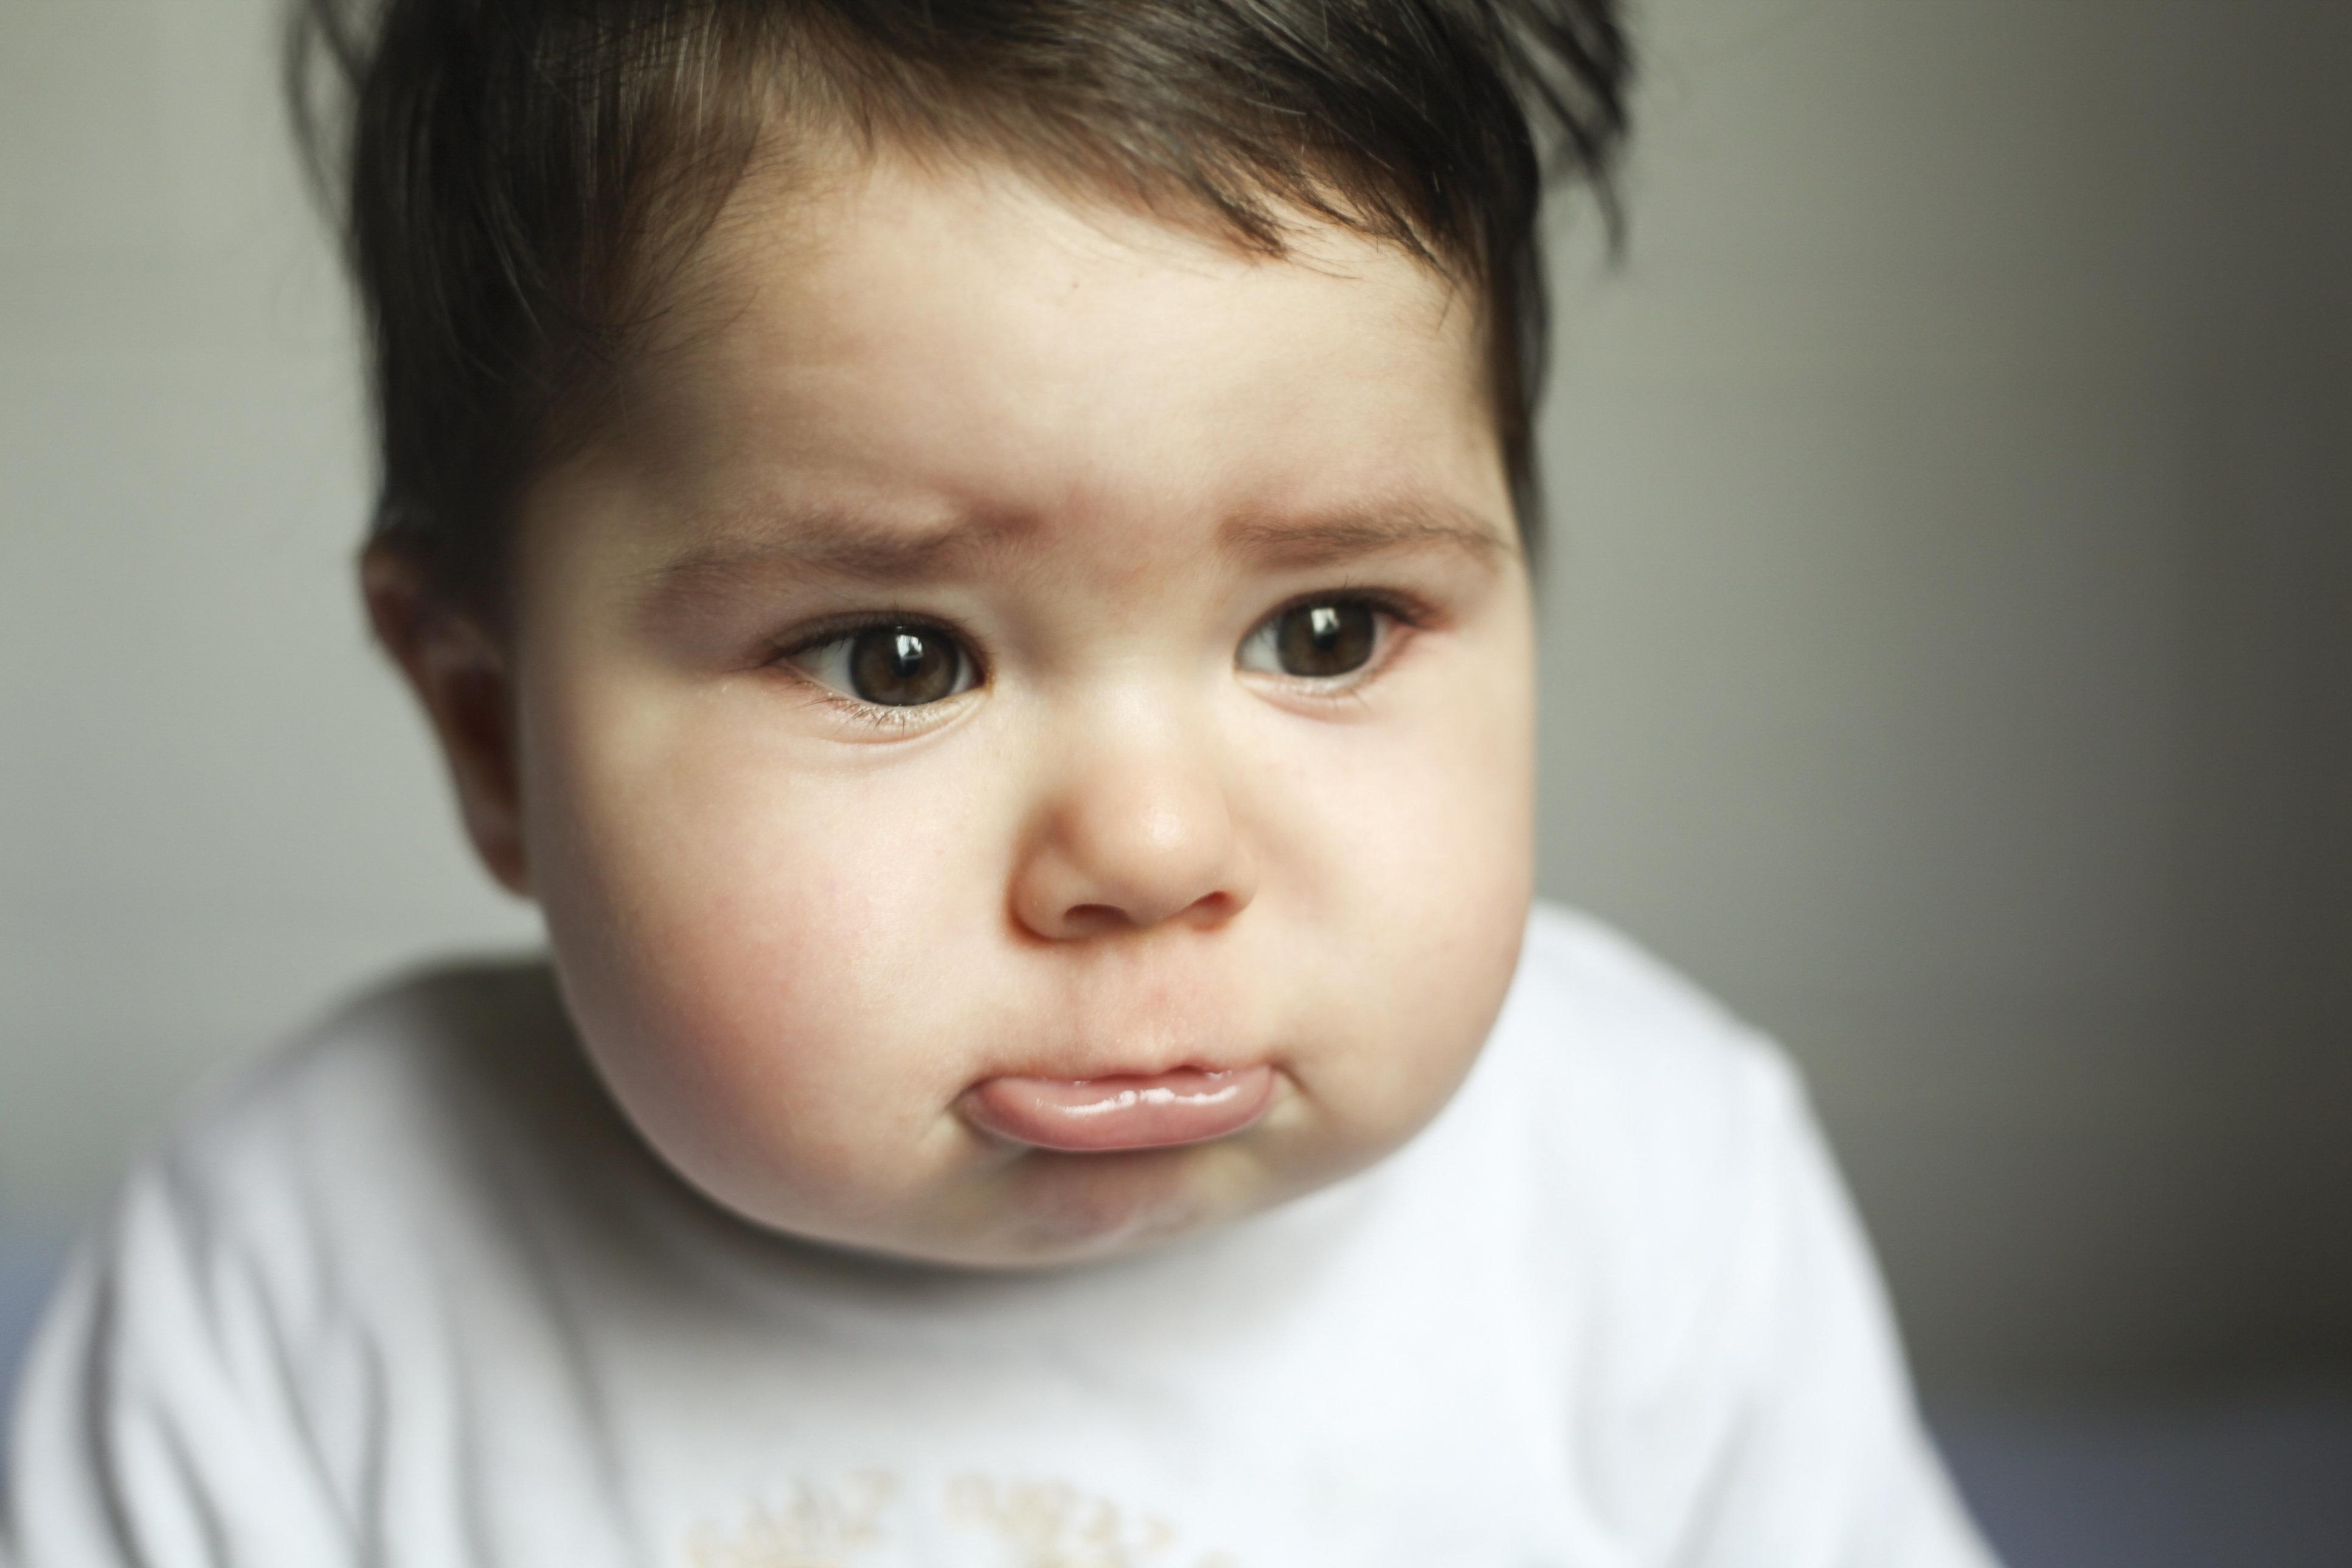 A 11-month baby boy sad ready to cry, Santa Cruz de Tenerife, Tenerife, Canary Islands, Spain.